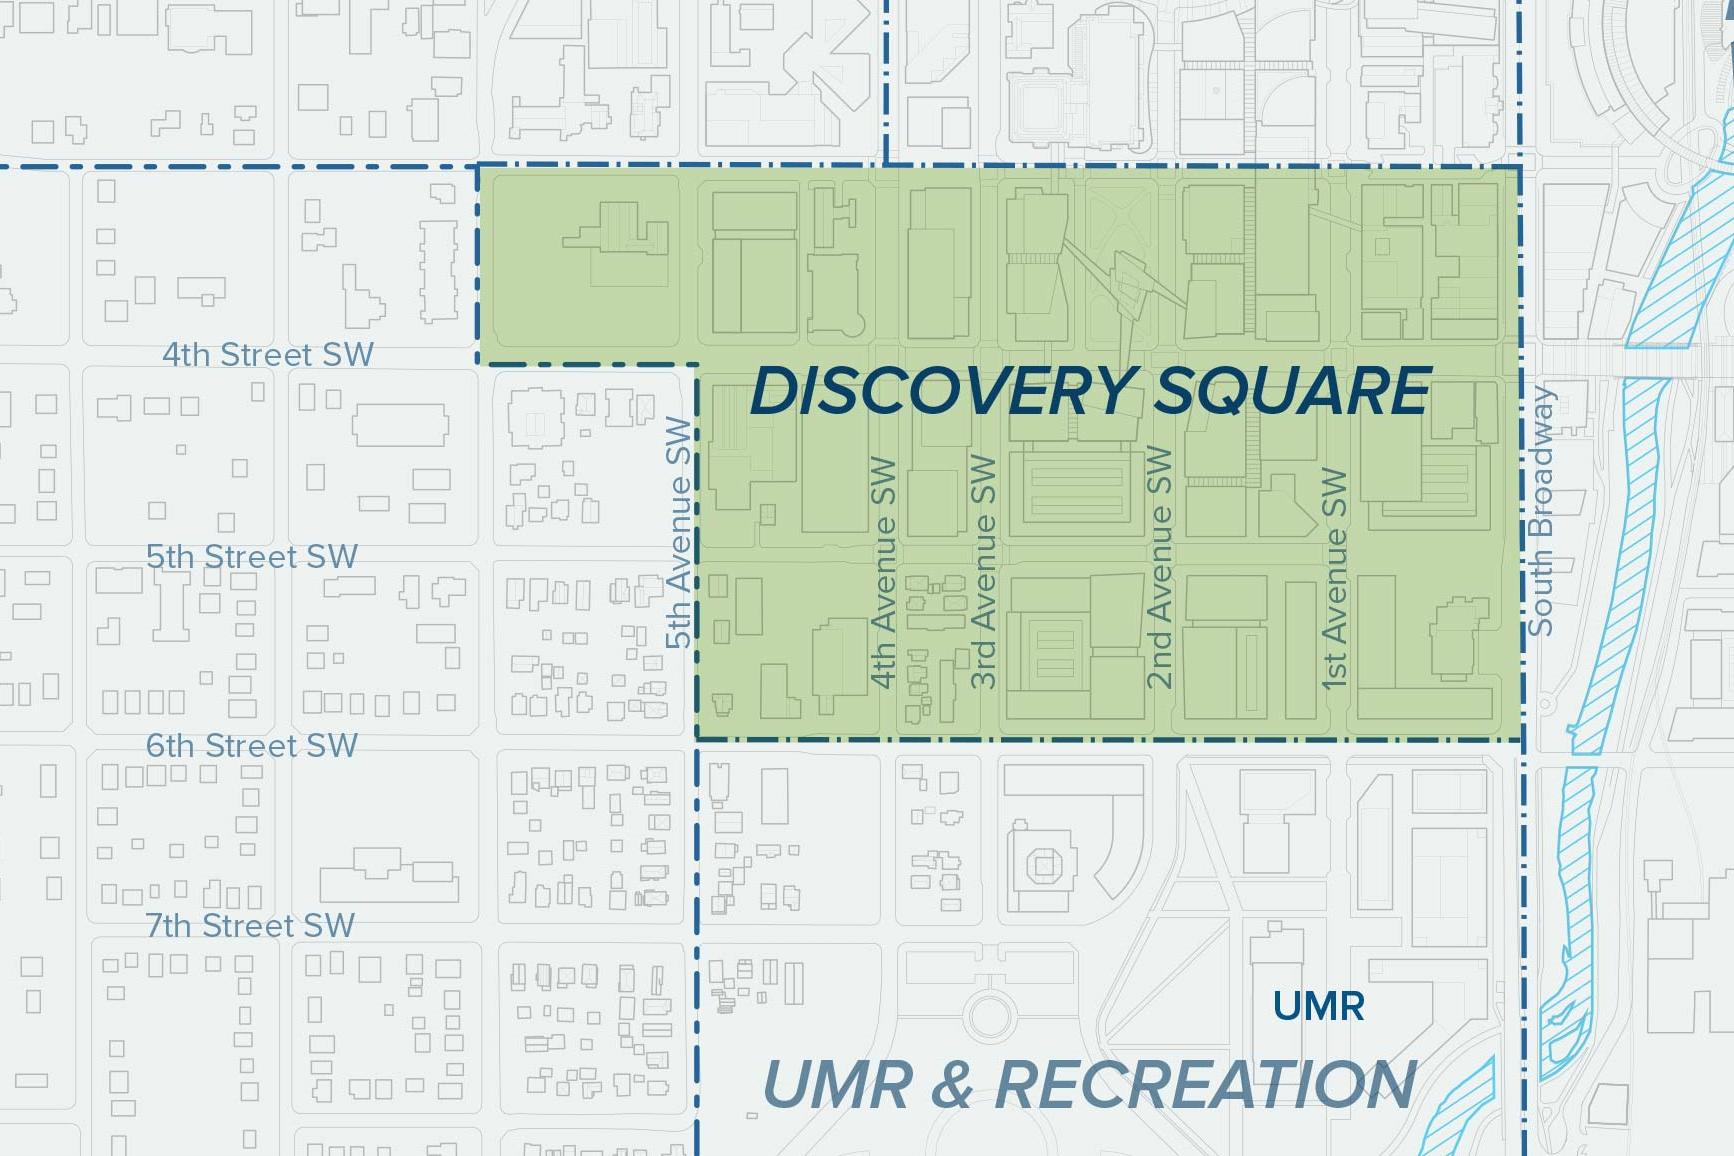 Graphic: DMC Development Plan